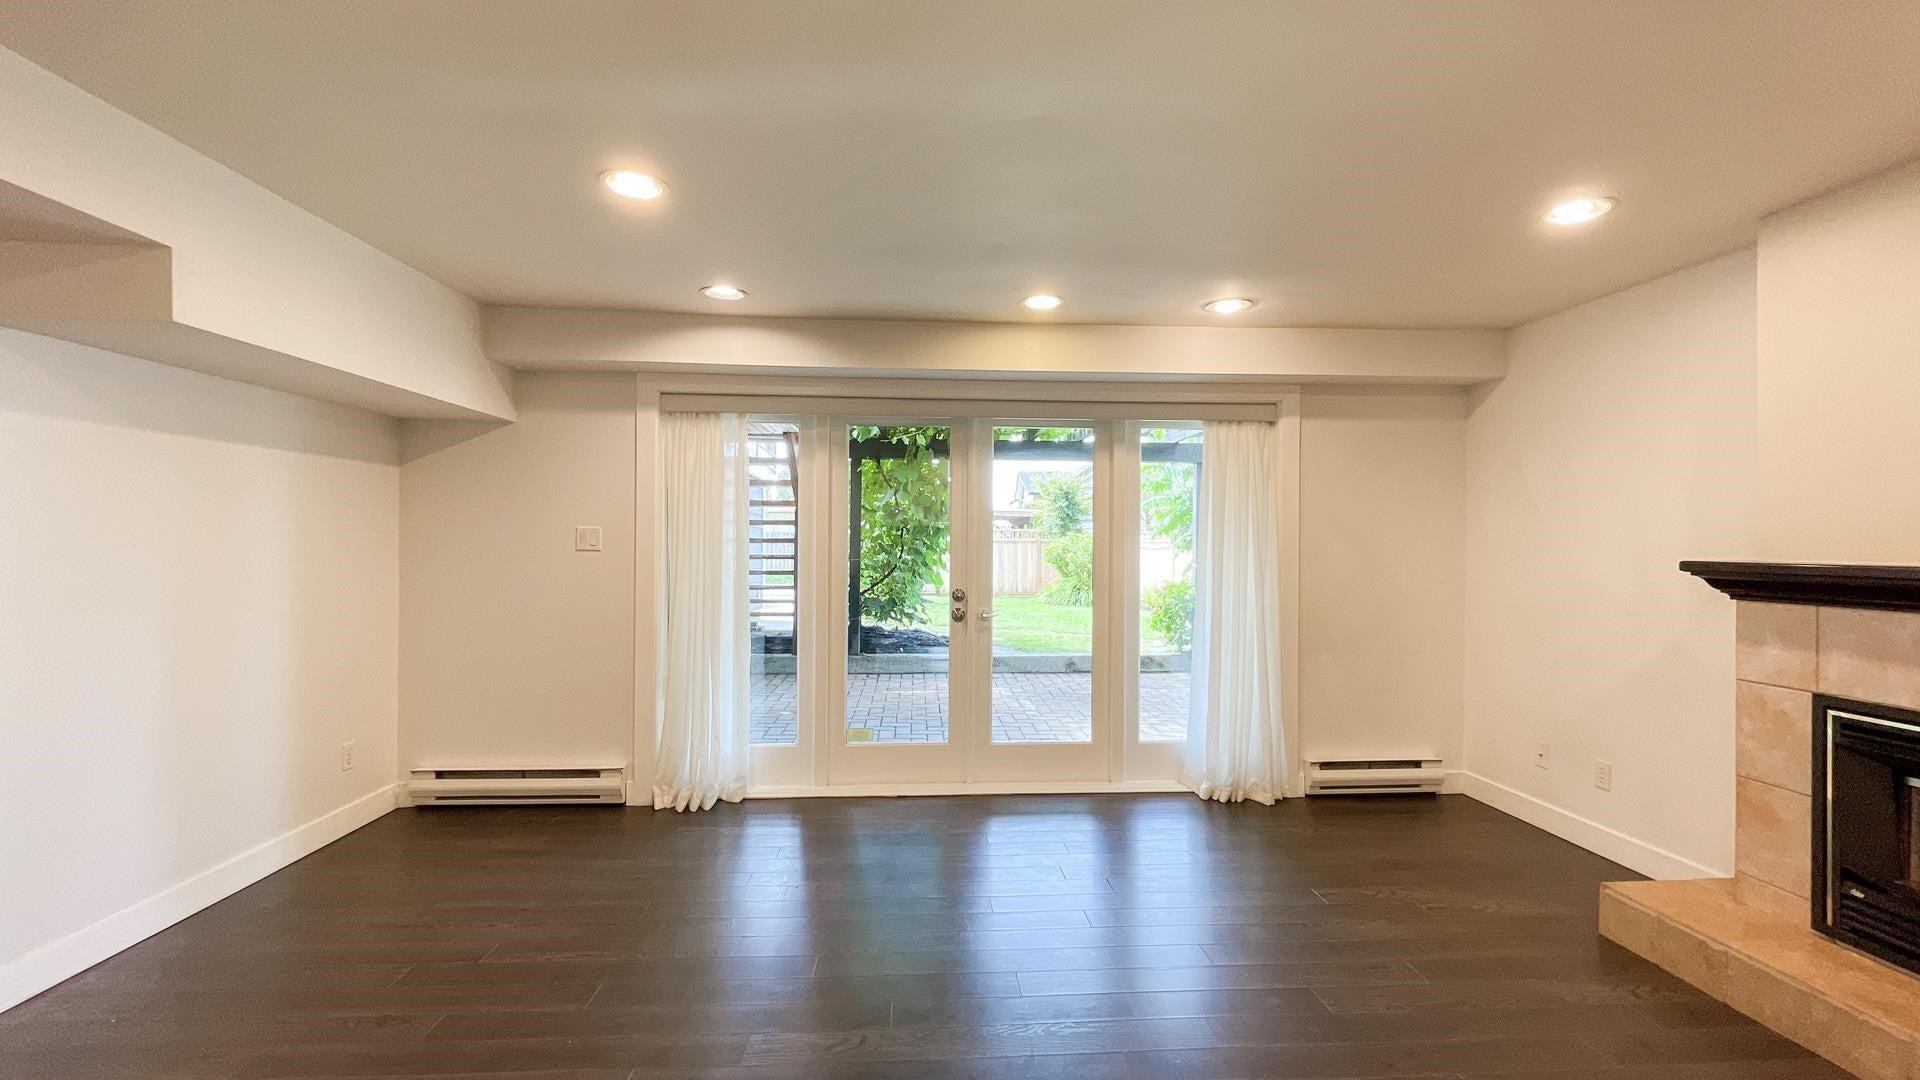 1168 JEFFERSON AVENUE - Ambleside House/Single Family for sale, 6 Bedrooms (R2602275) - #22